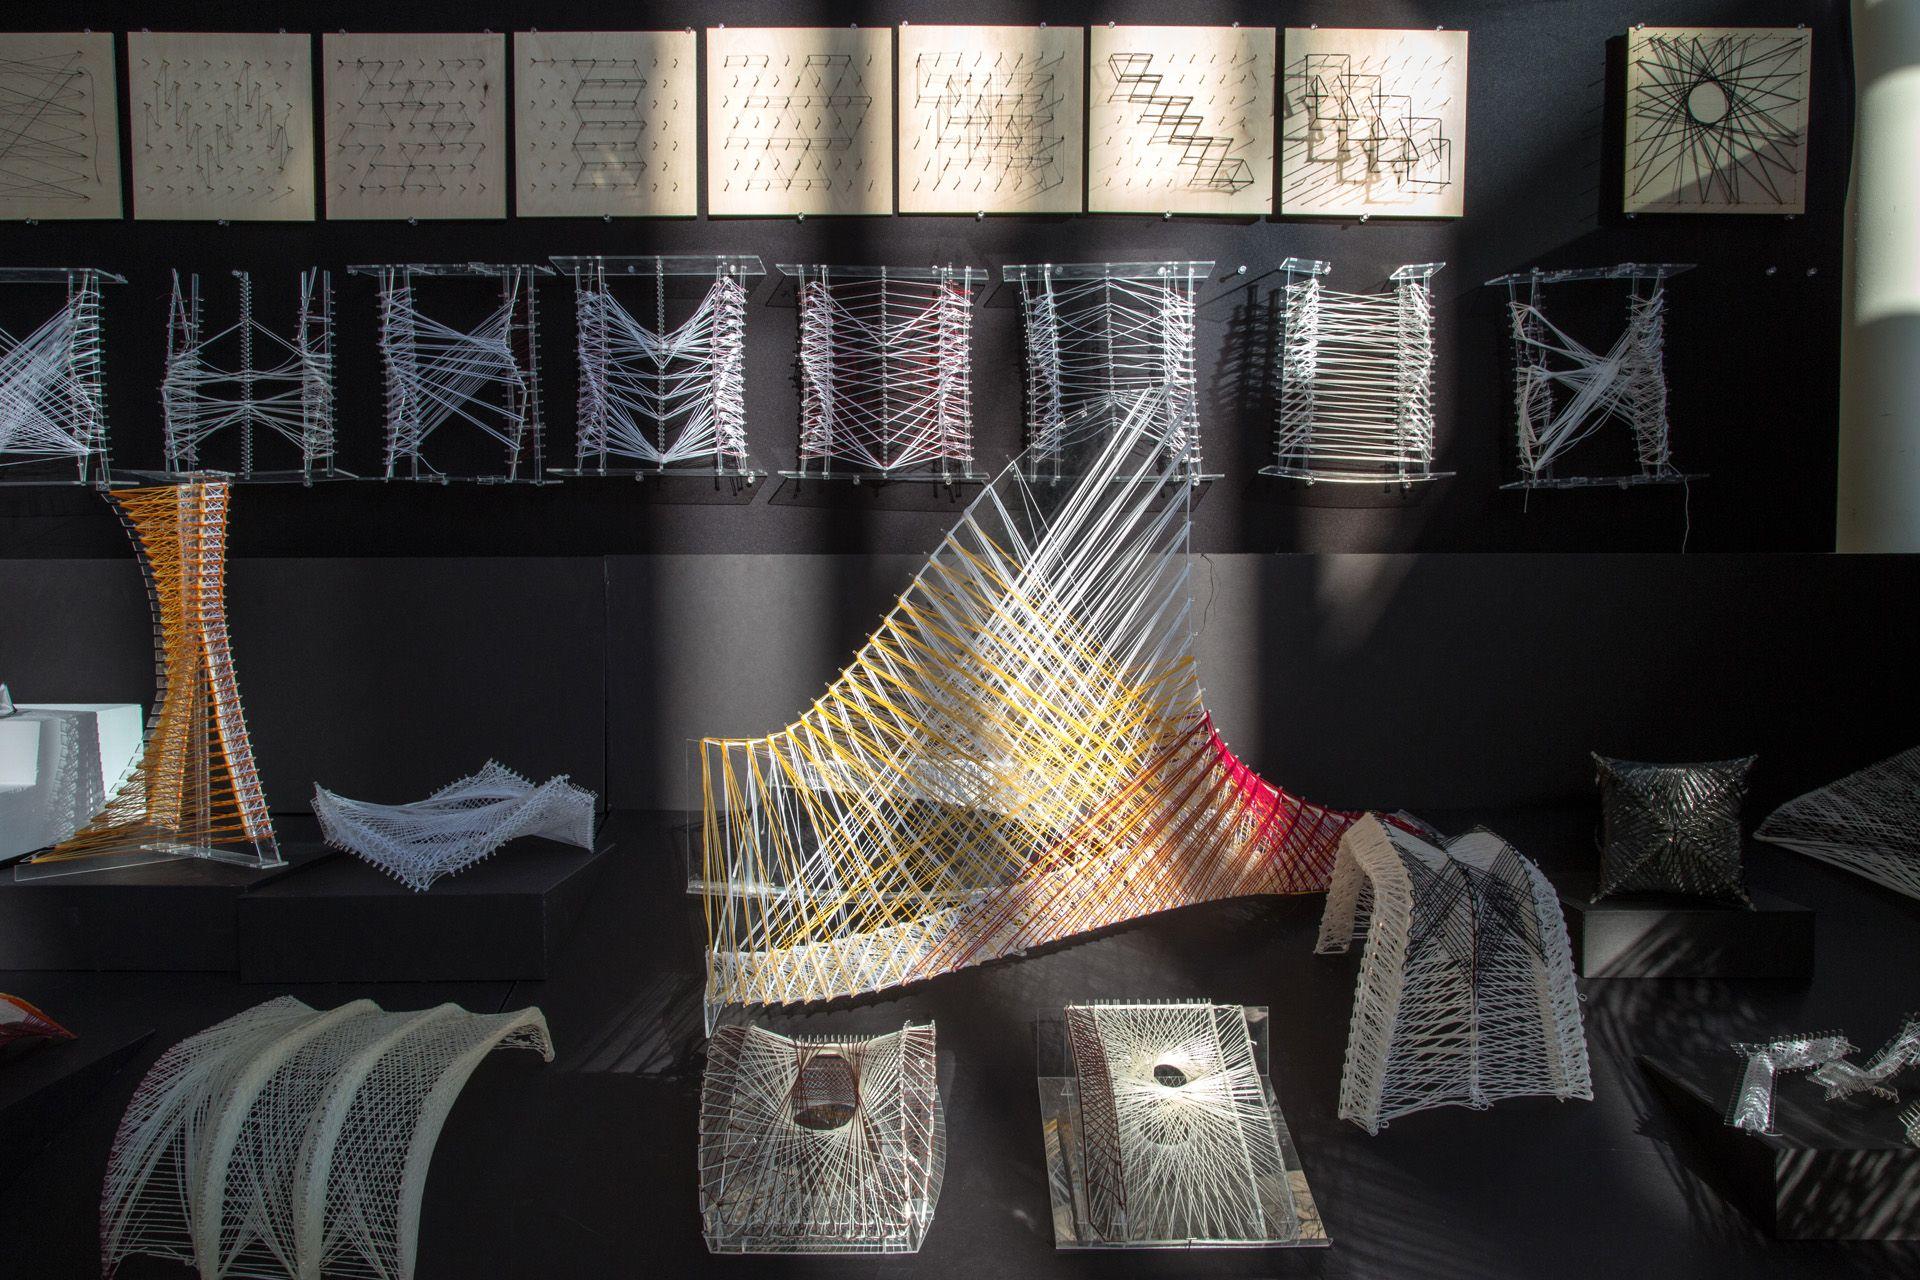 Dorm rooms at harvard harvard graduate school of design  homepage  dreamscapes